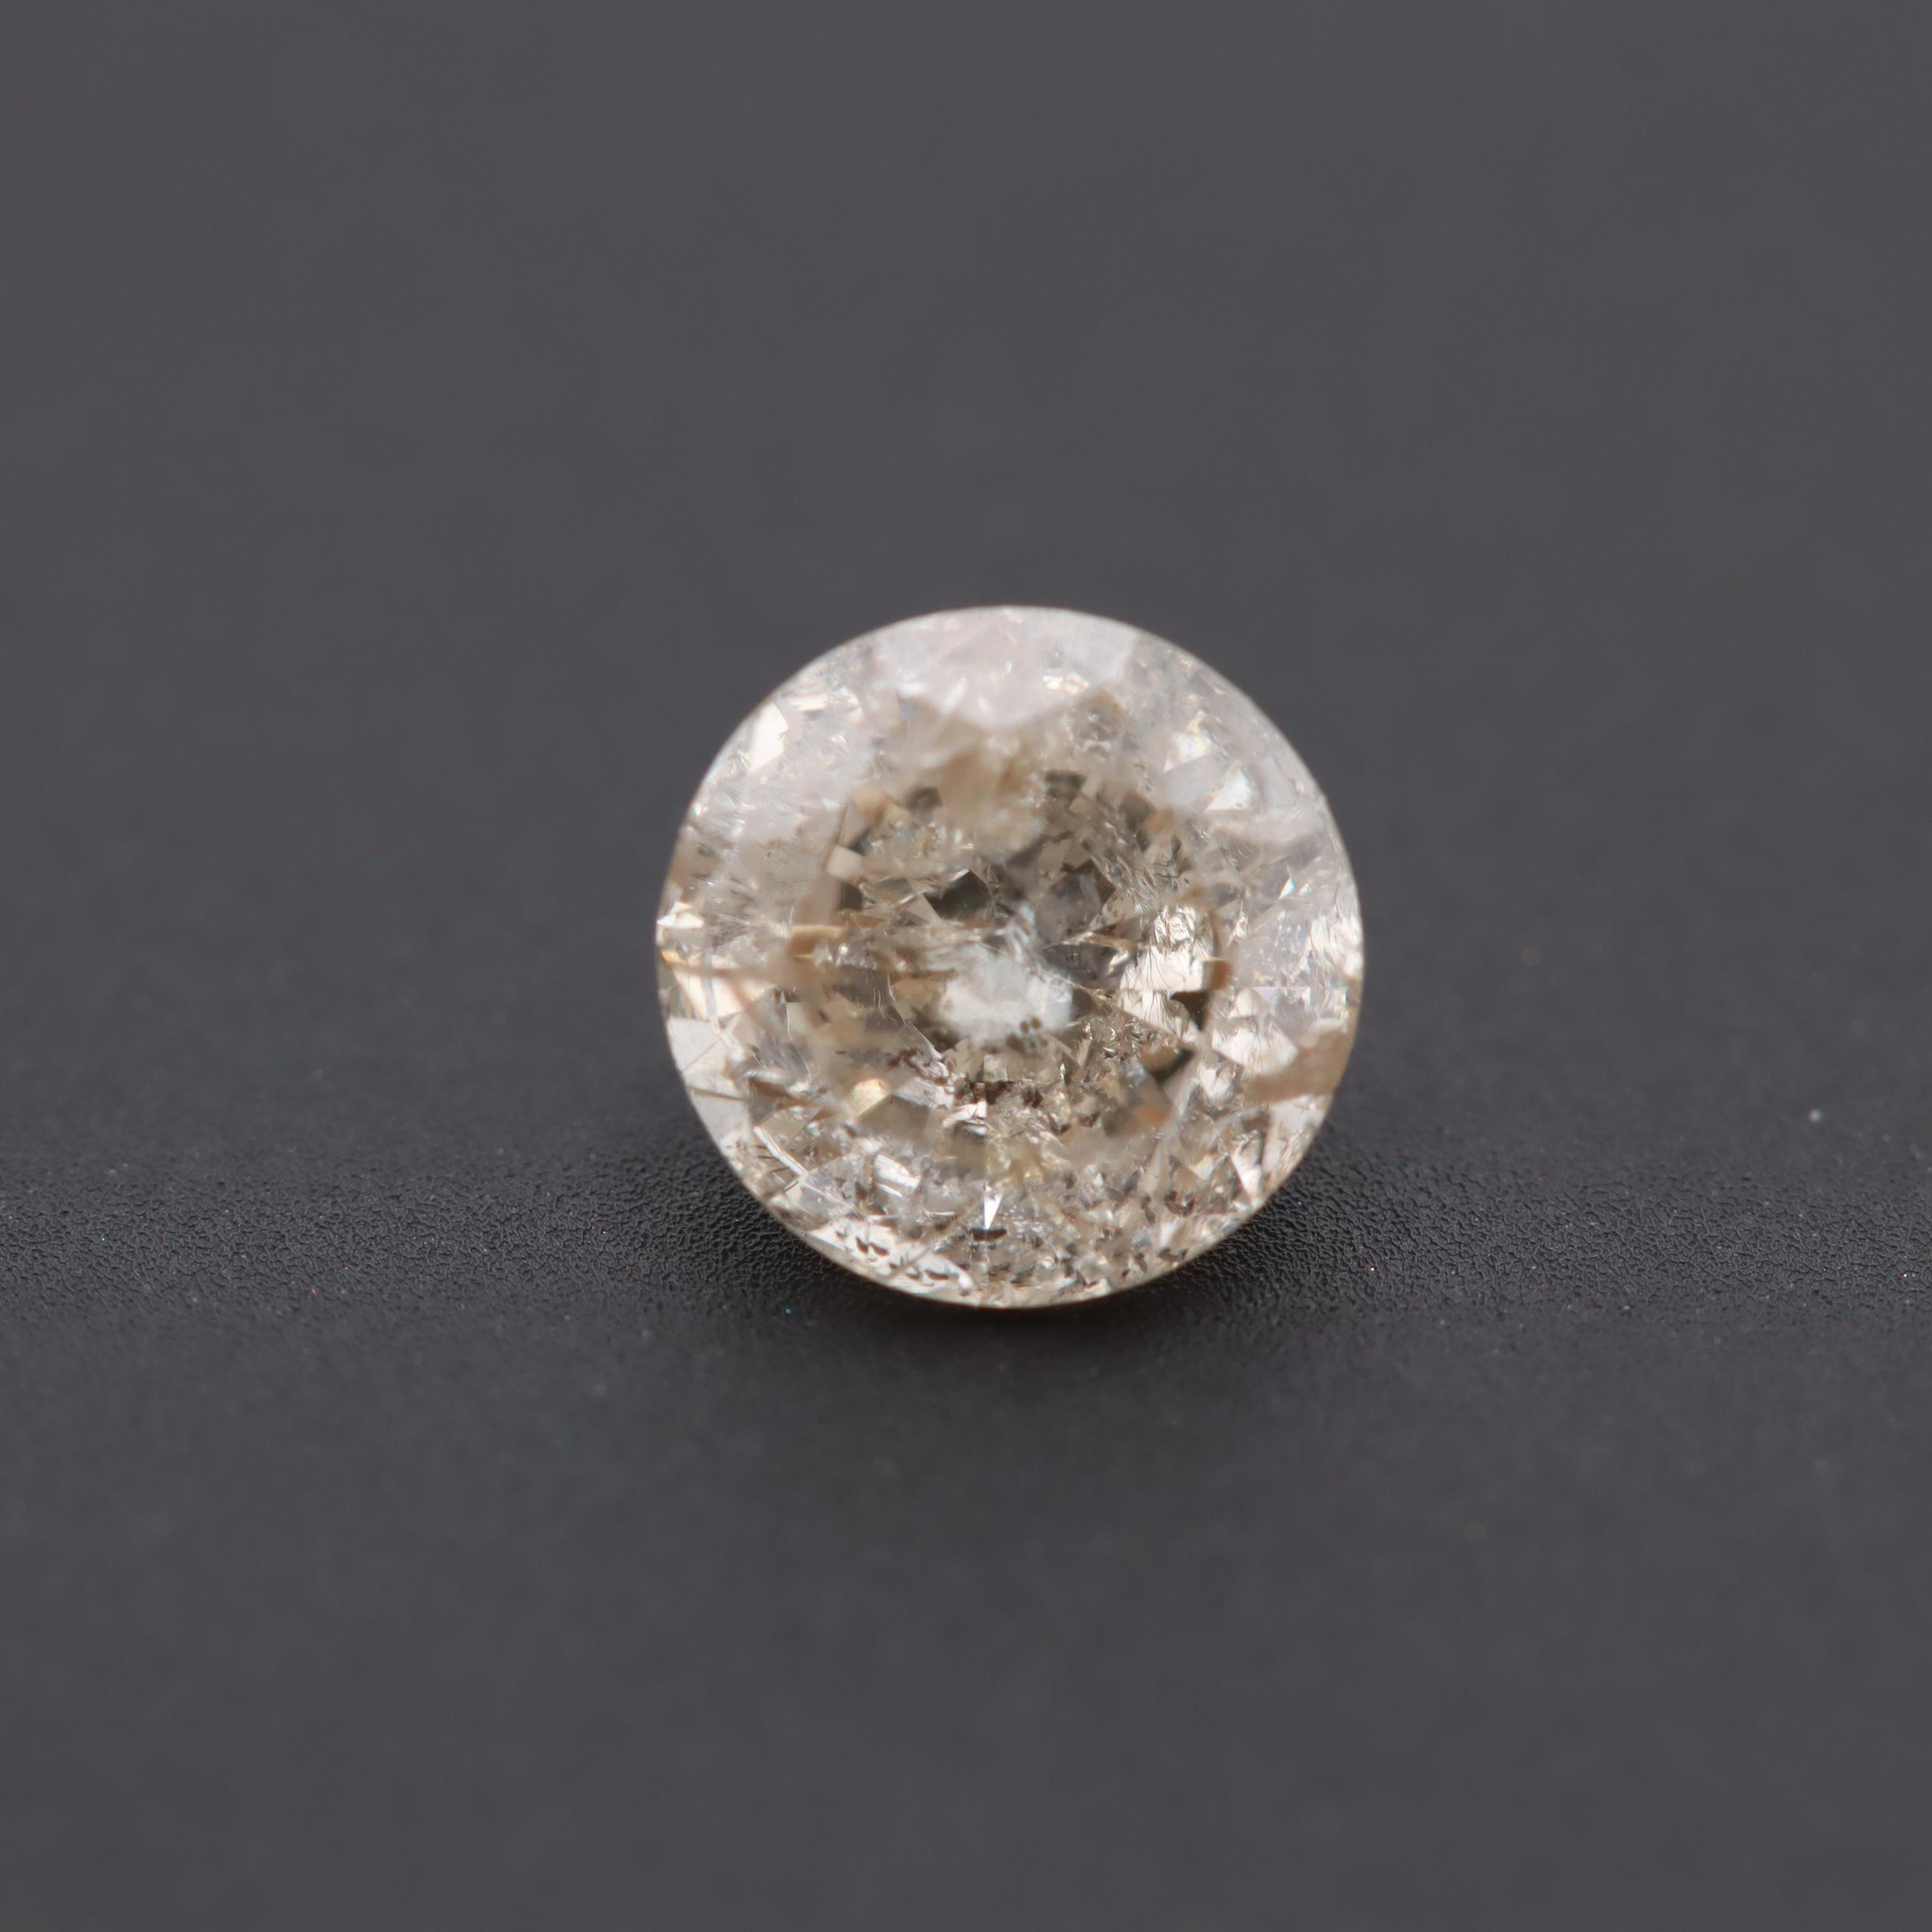 Loose 0.62 CT Diamond